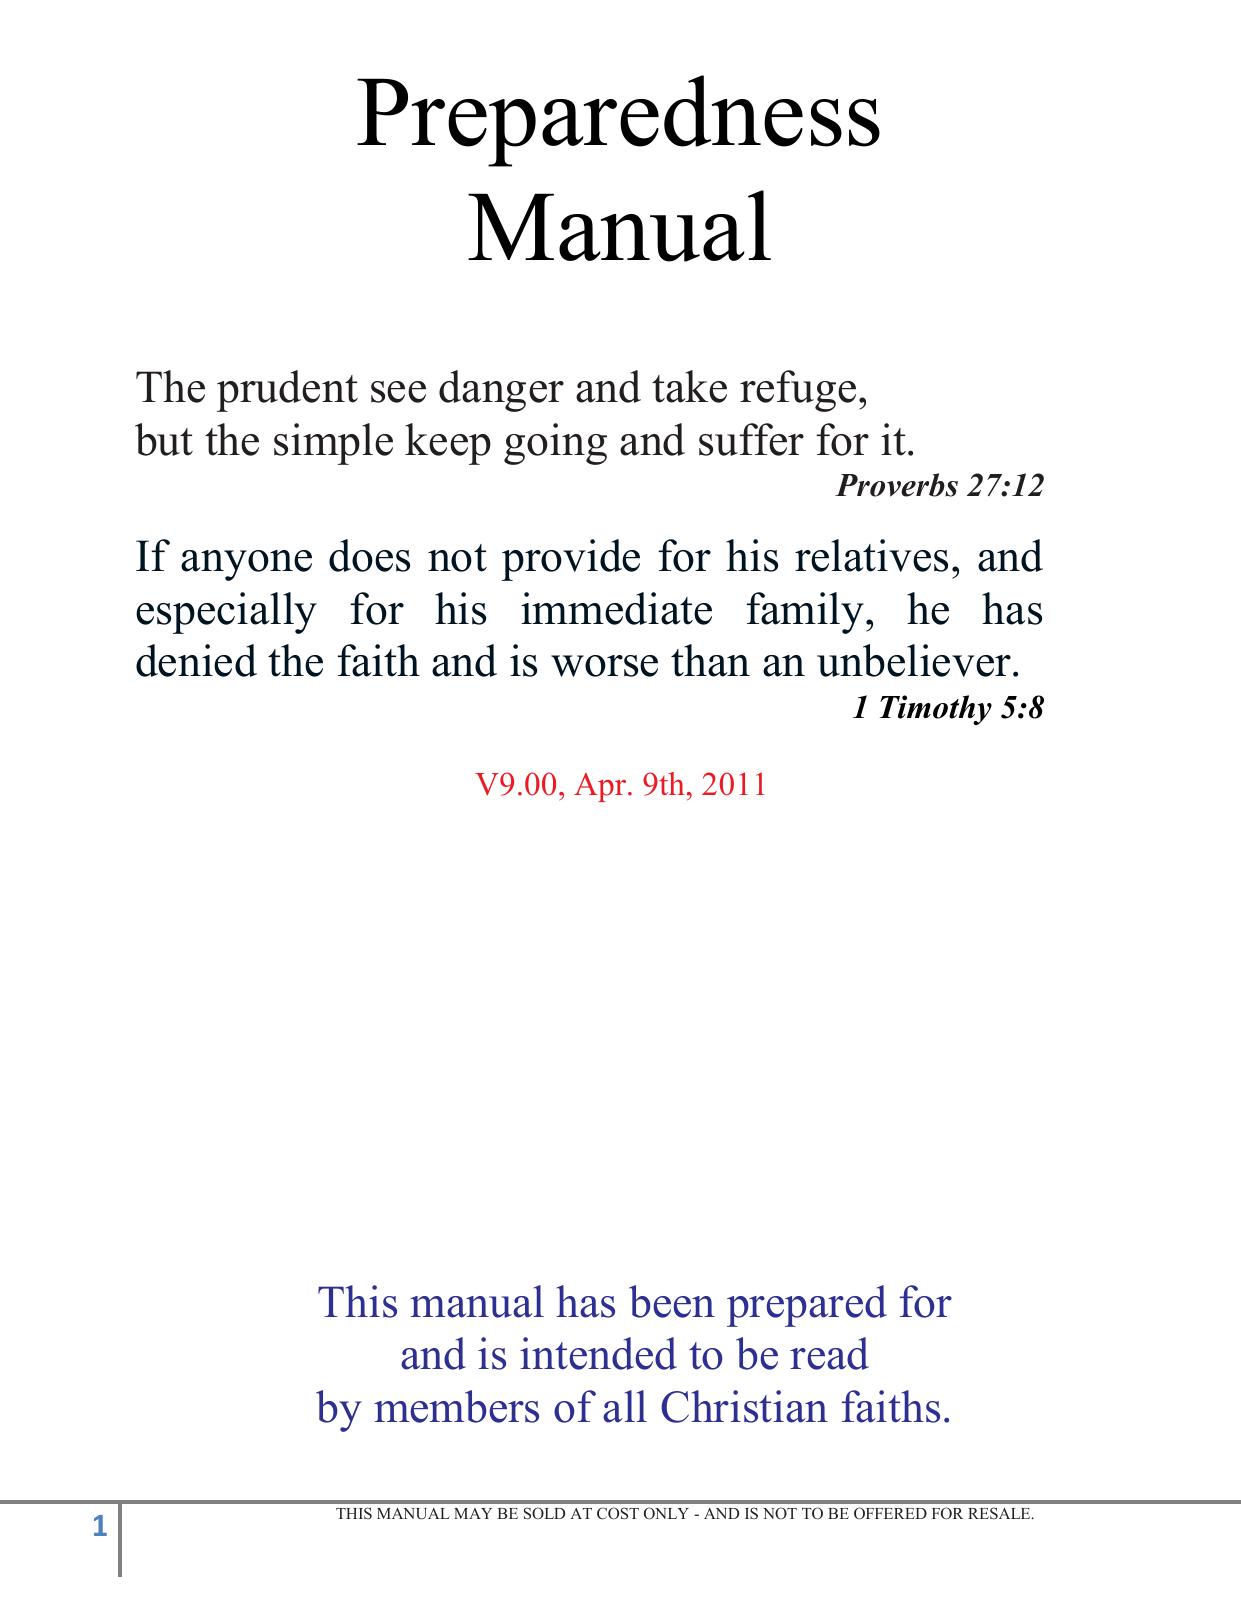 Preparedness Manual | manualzz.com on